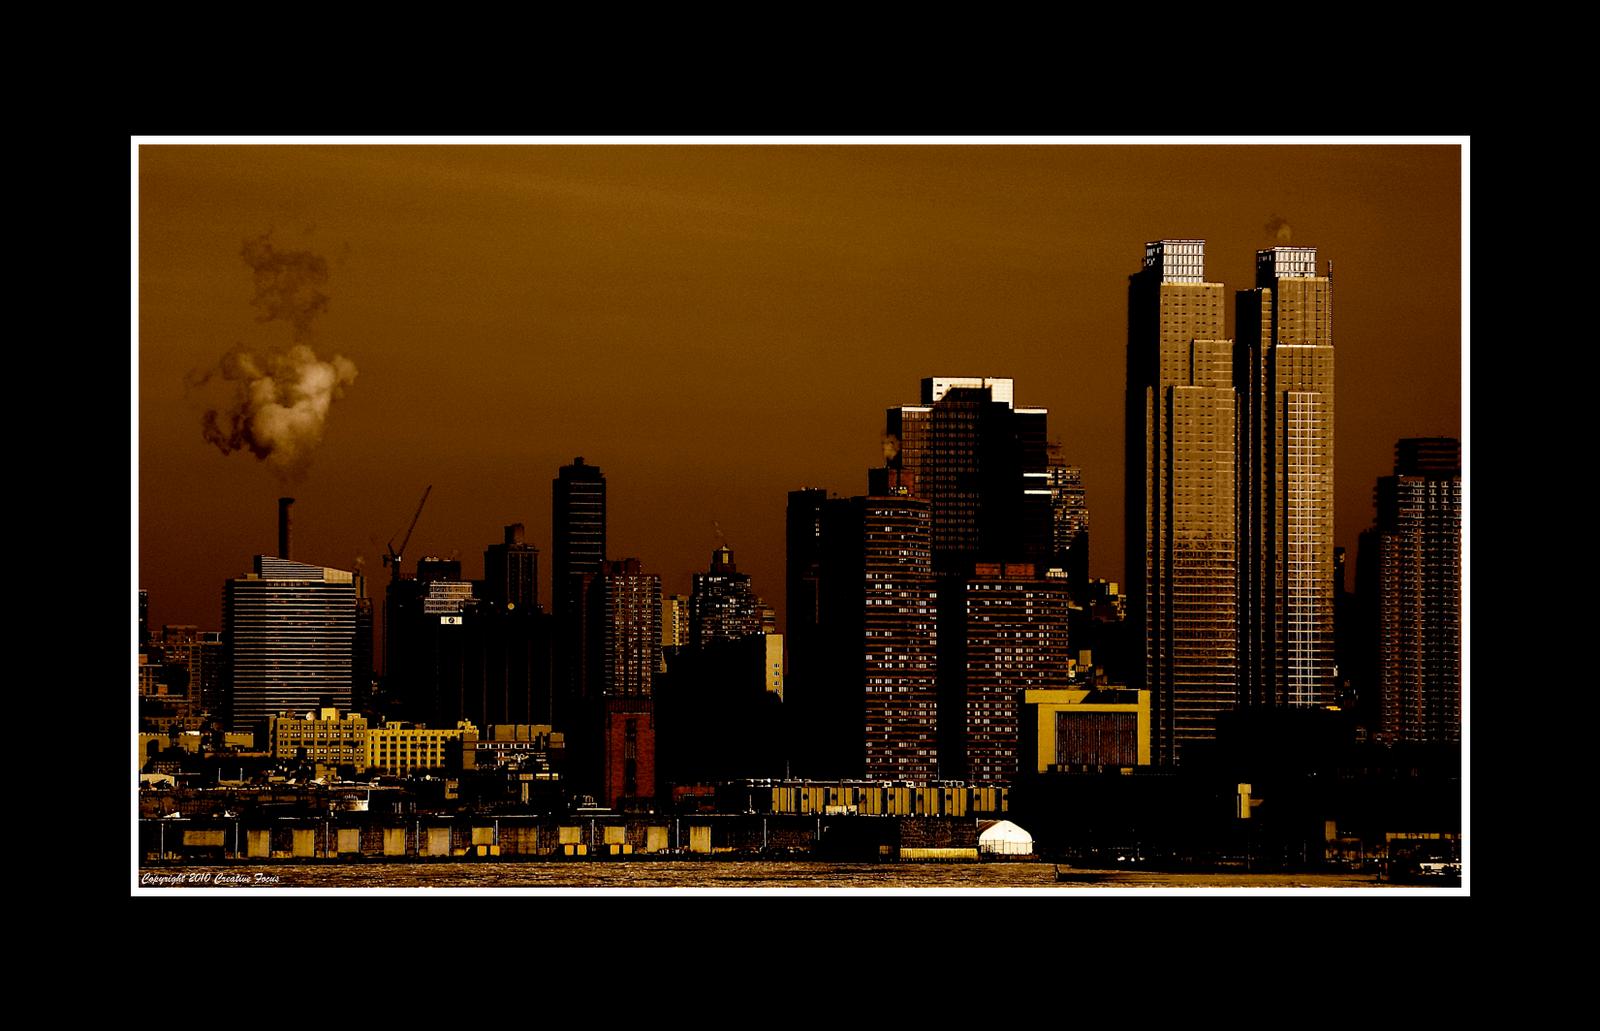 Manhattan Across the Hudson by Trippy4U